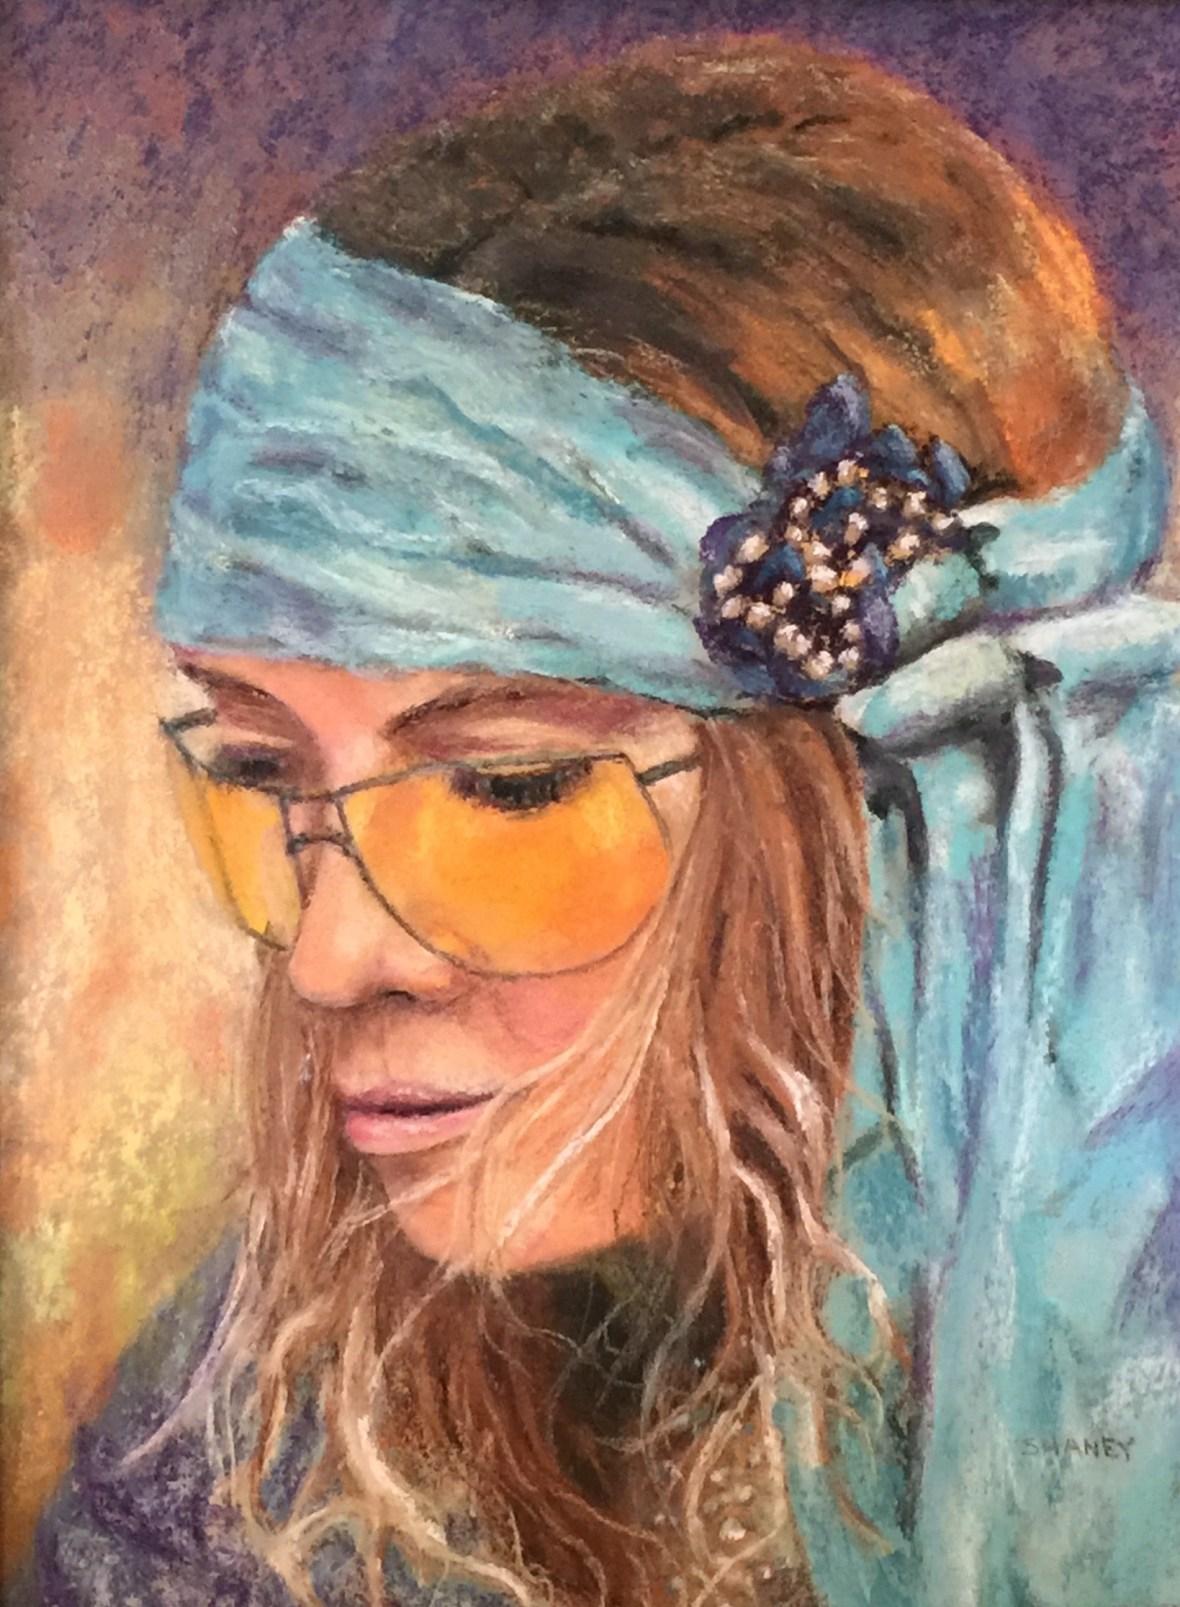 Sharon Haney Art | West Texas Artist